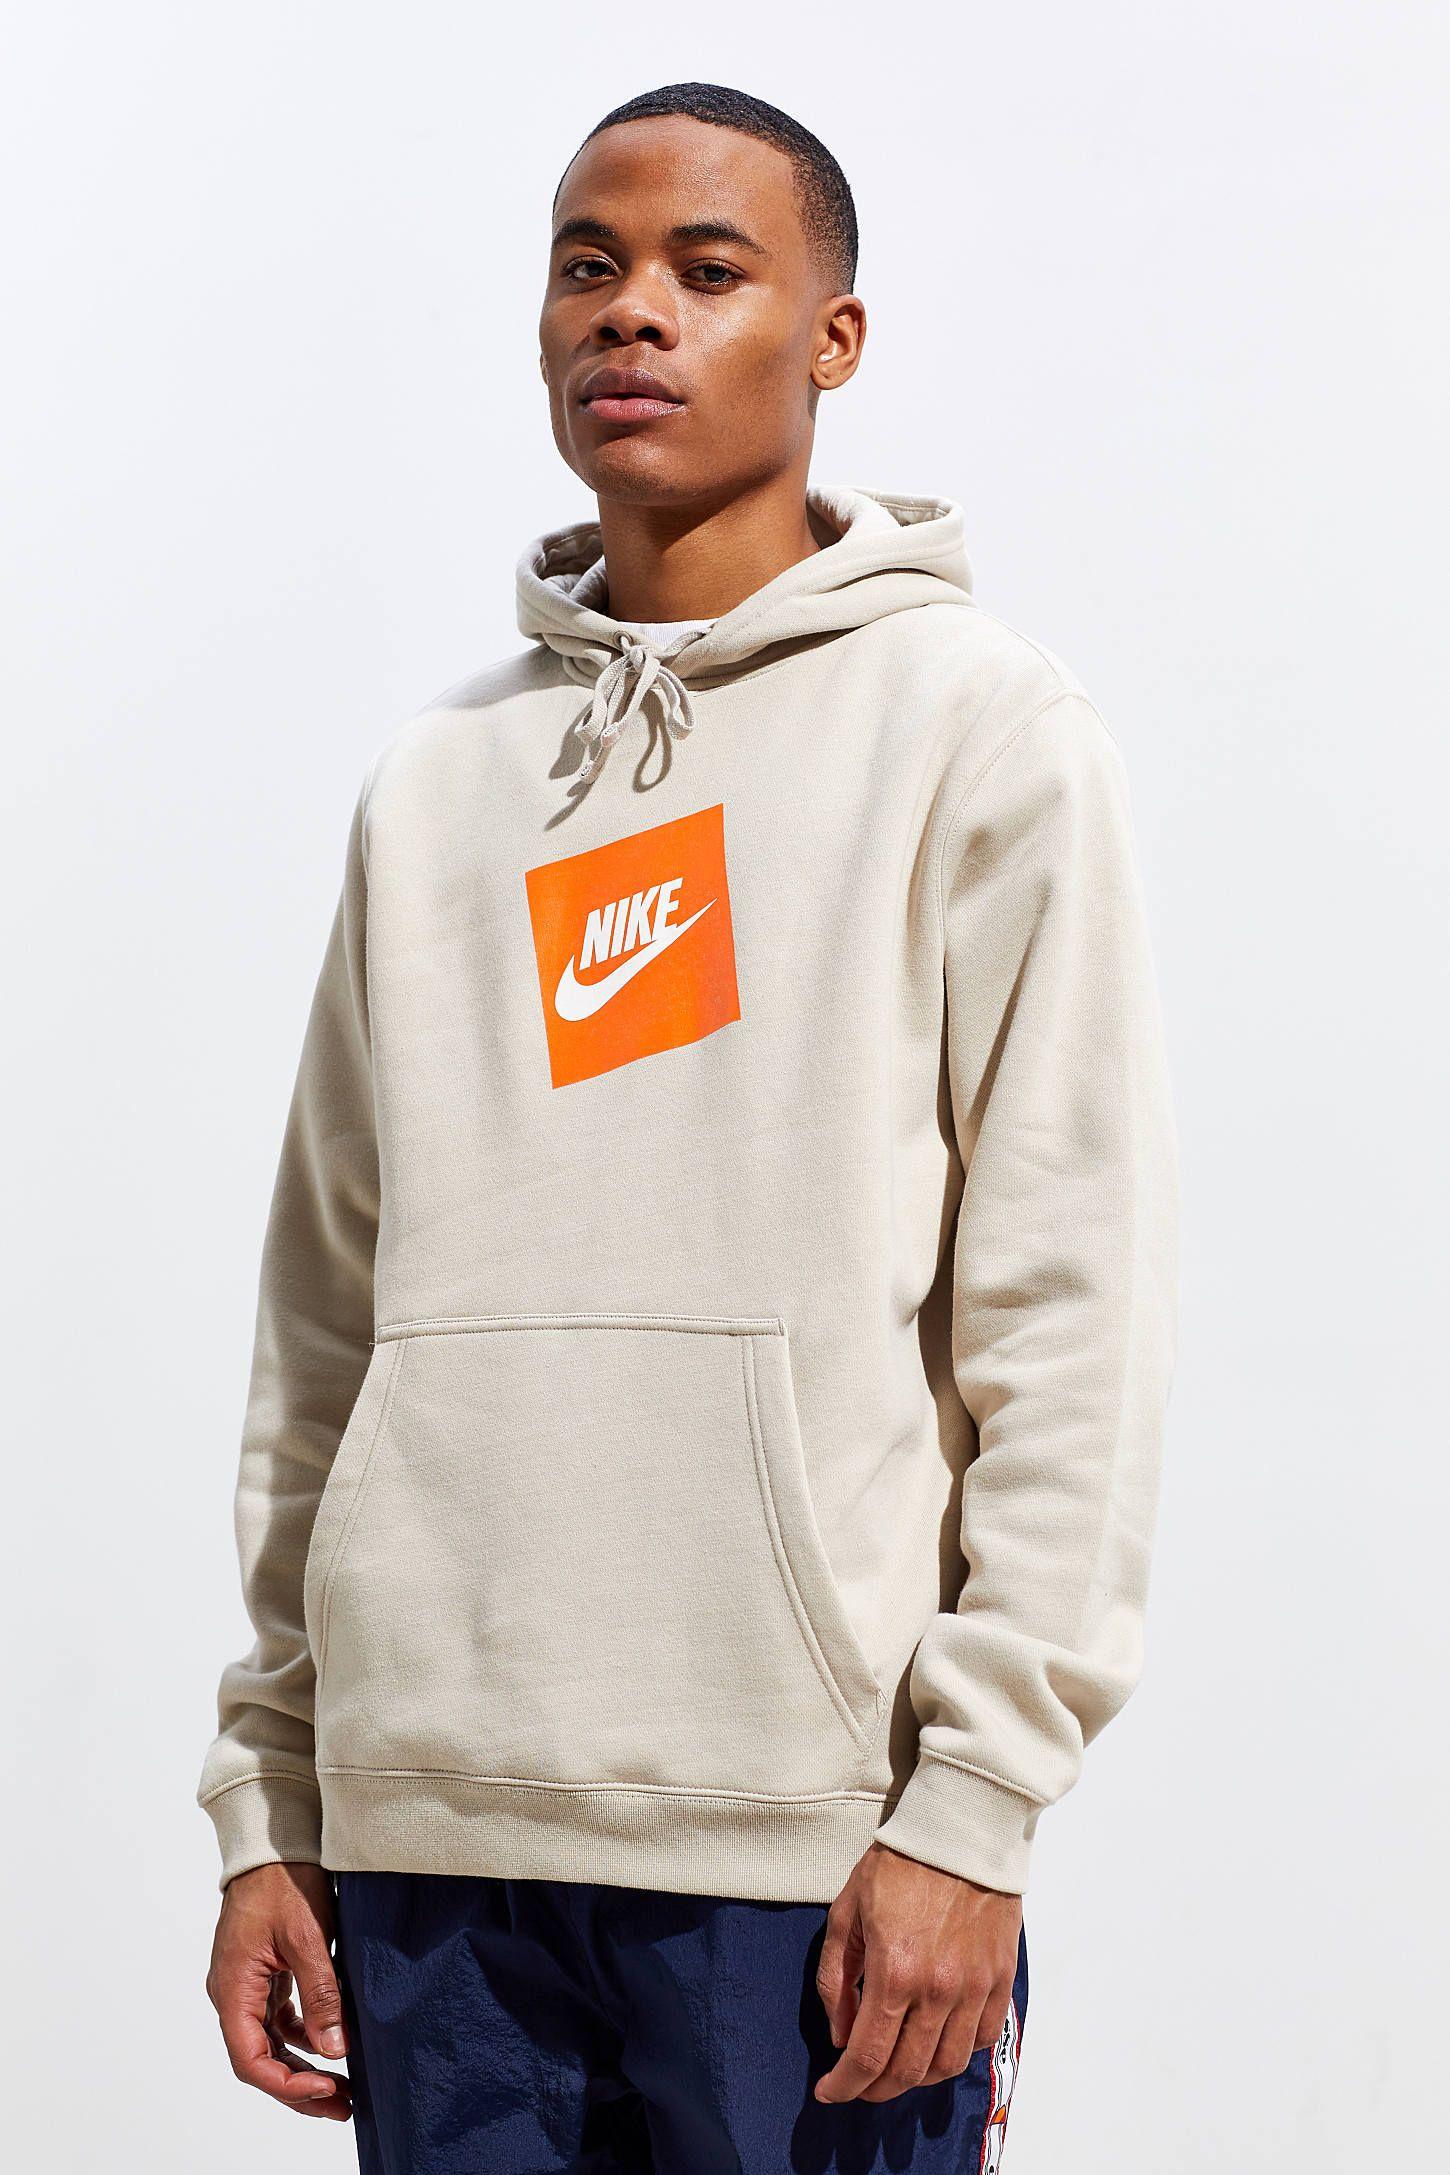 Nike Box Logo Hoodie Sweatshirt Sweatshirts Hoodie Hoodies Box Logo Hoodie [ 2175 x 1450 Pixel ]